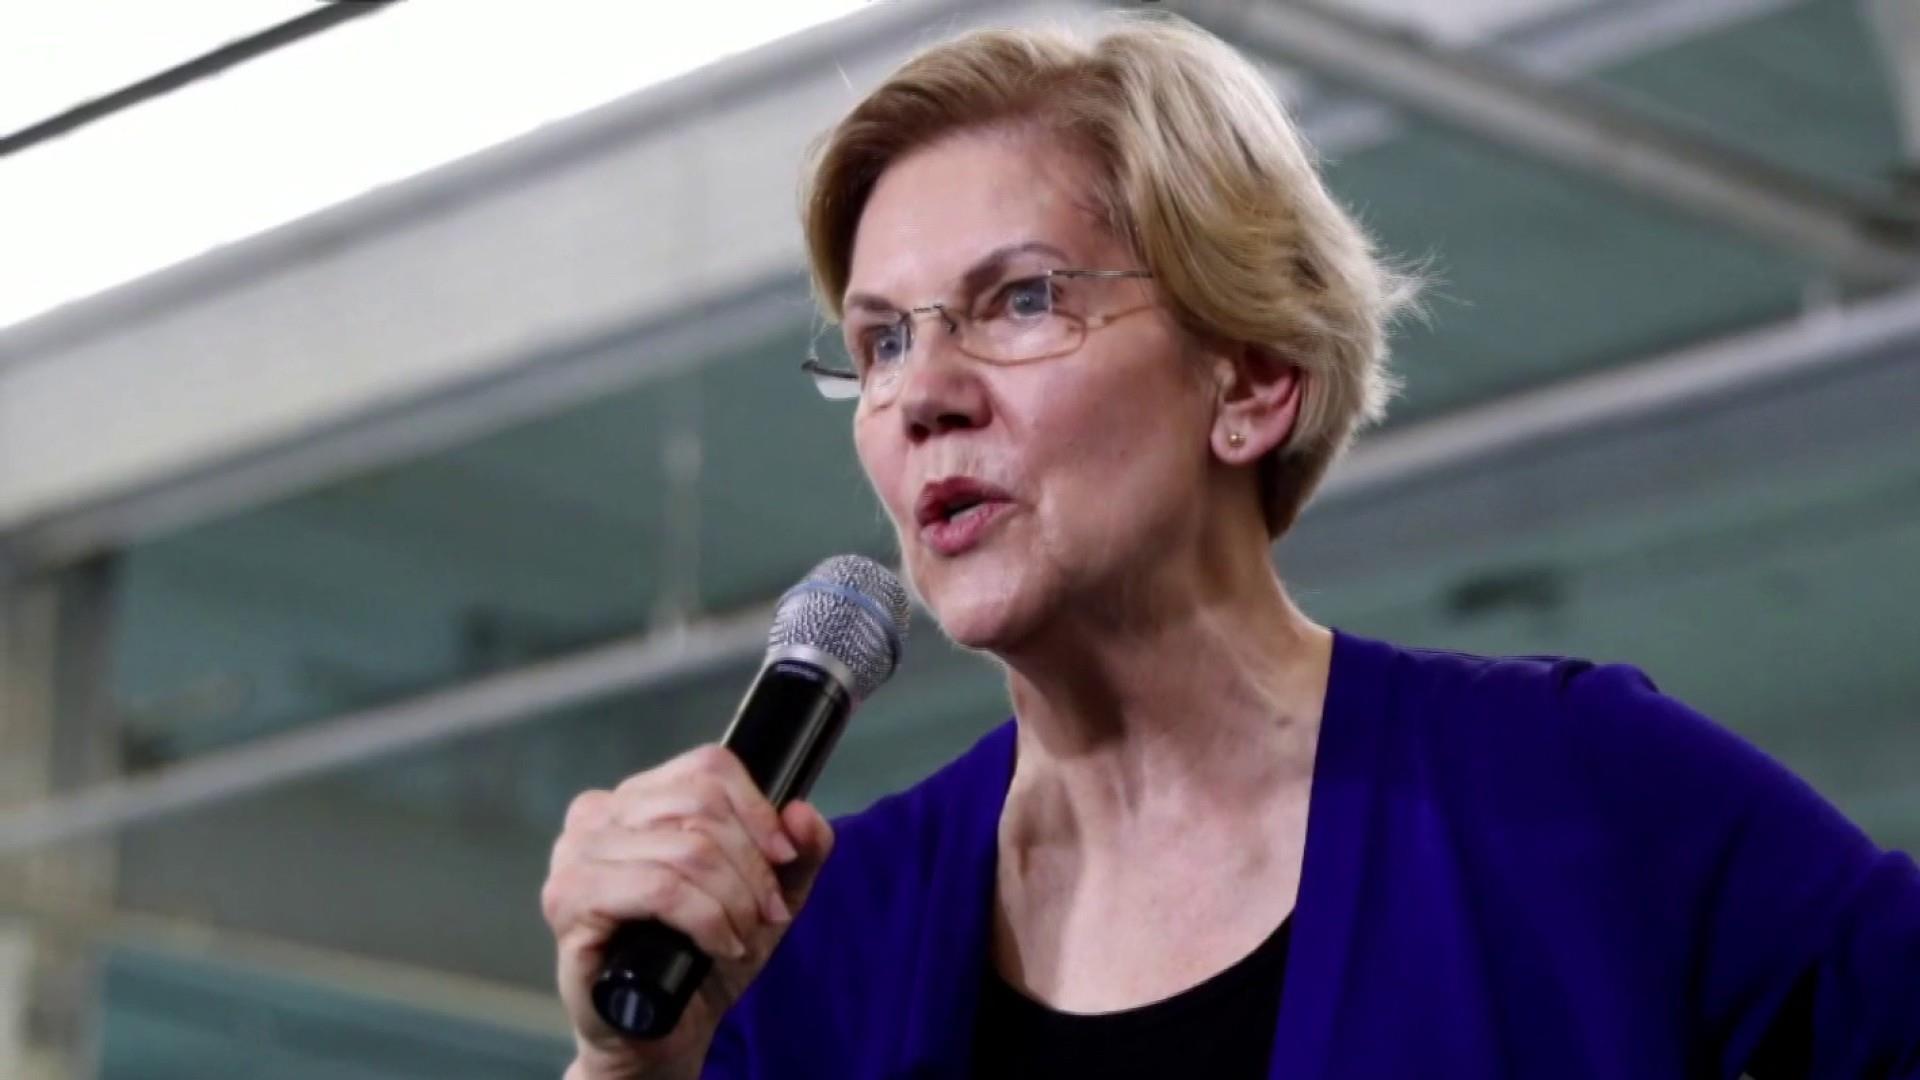 All eyes on Elizabeth Warren at first Dem debate